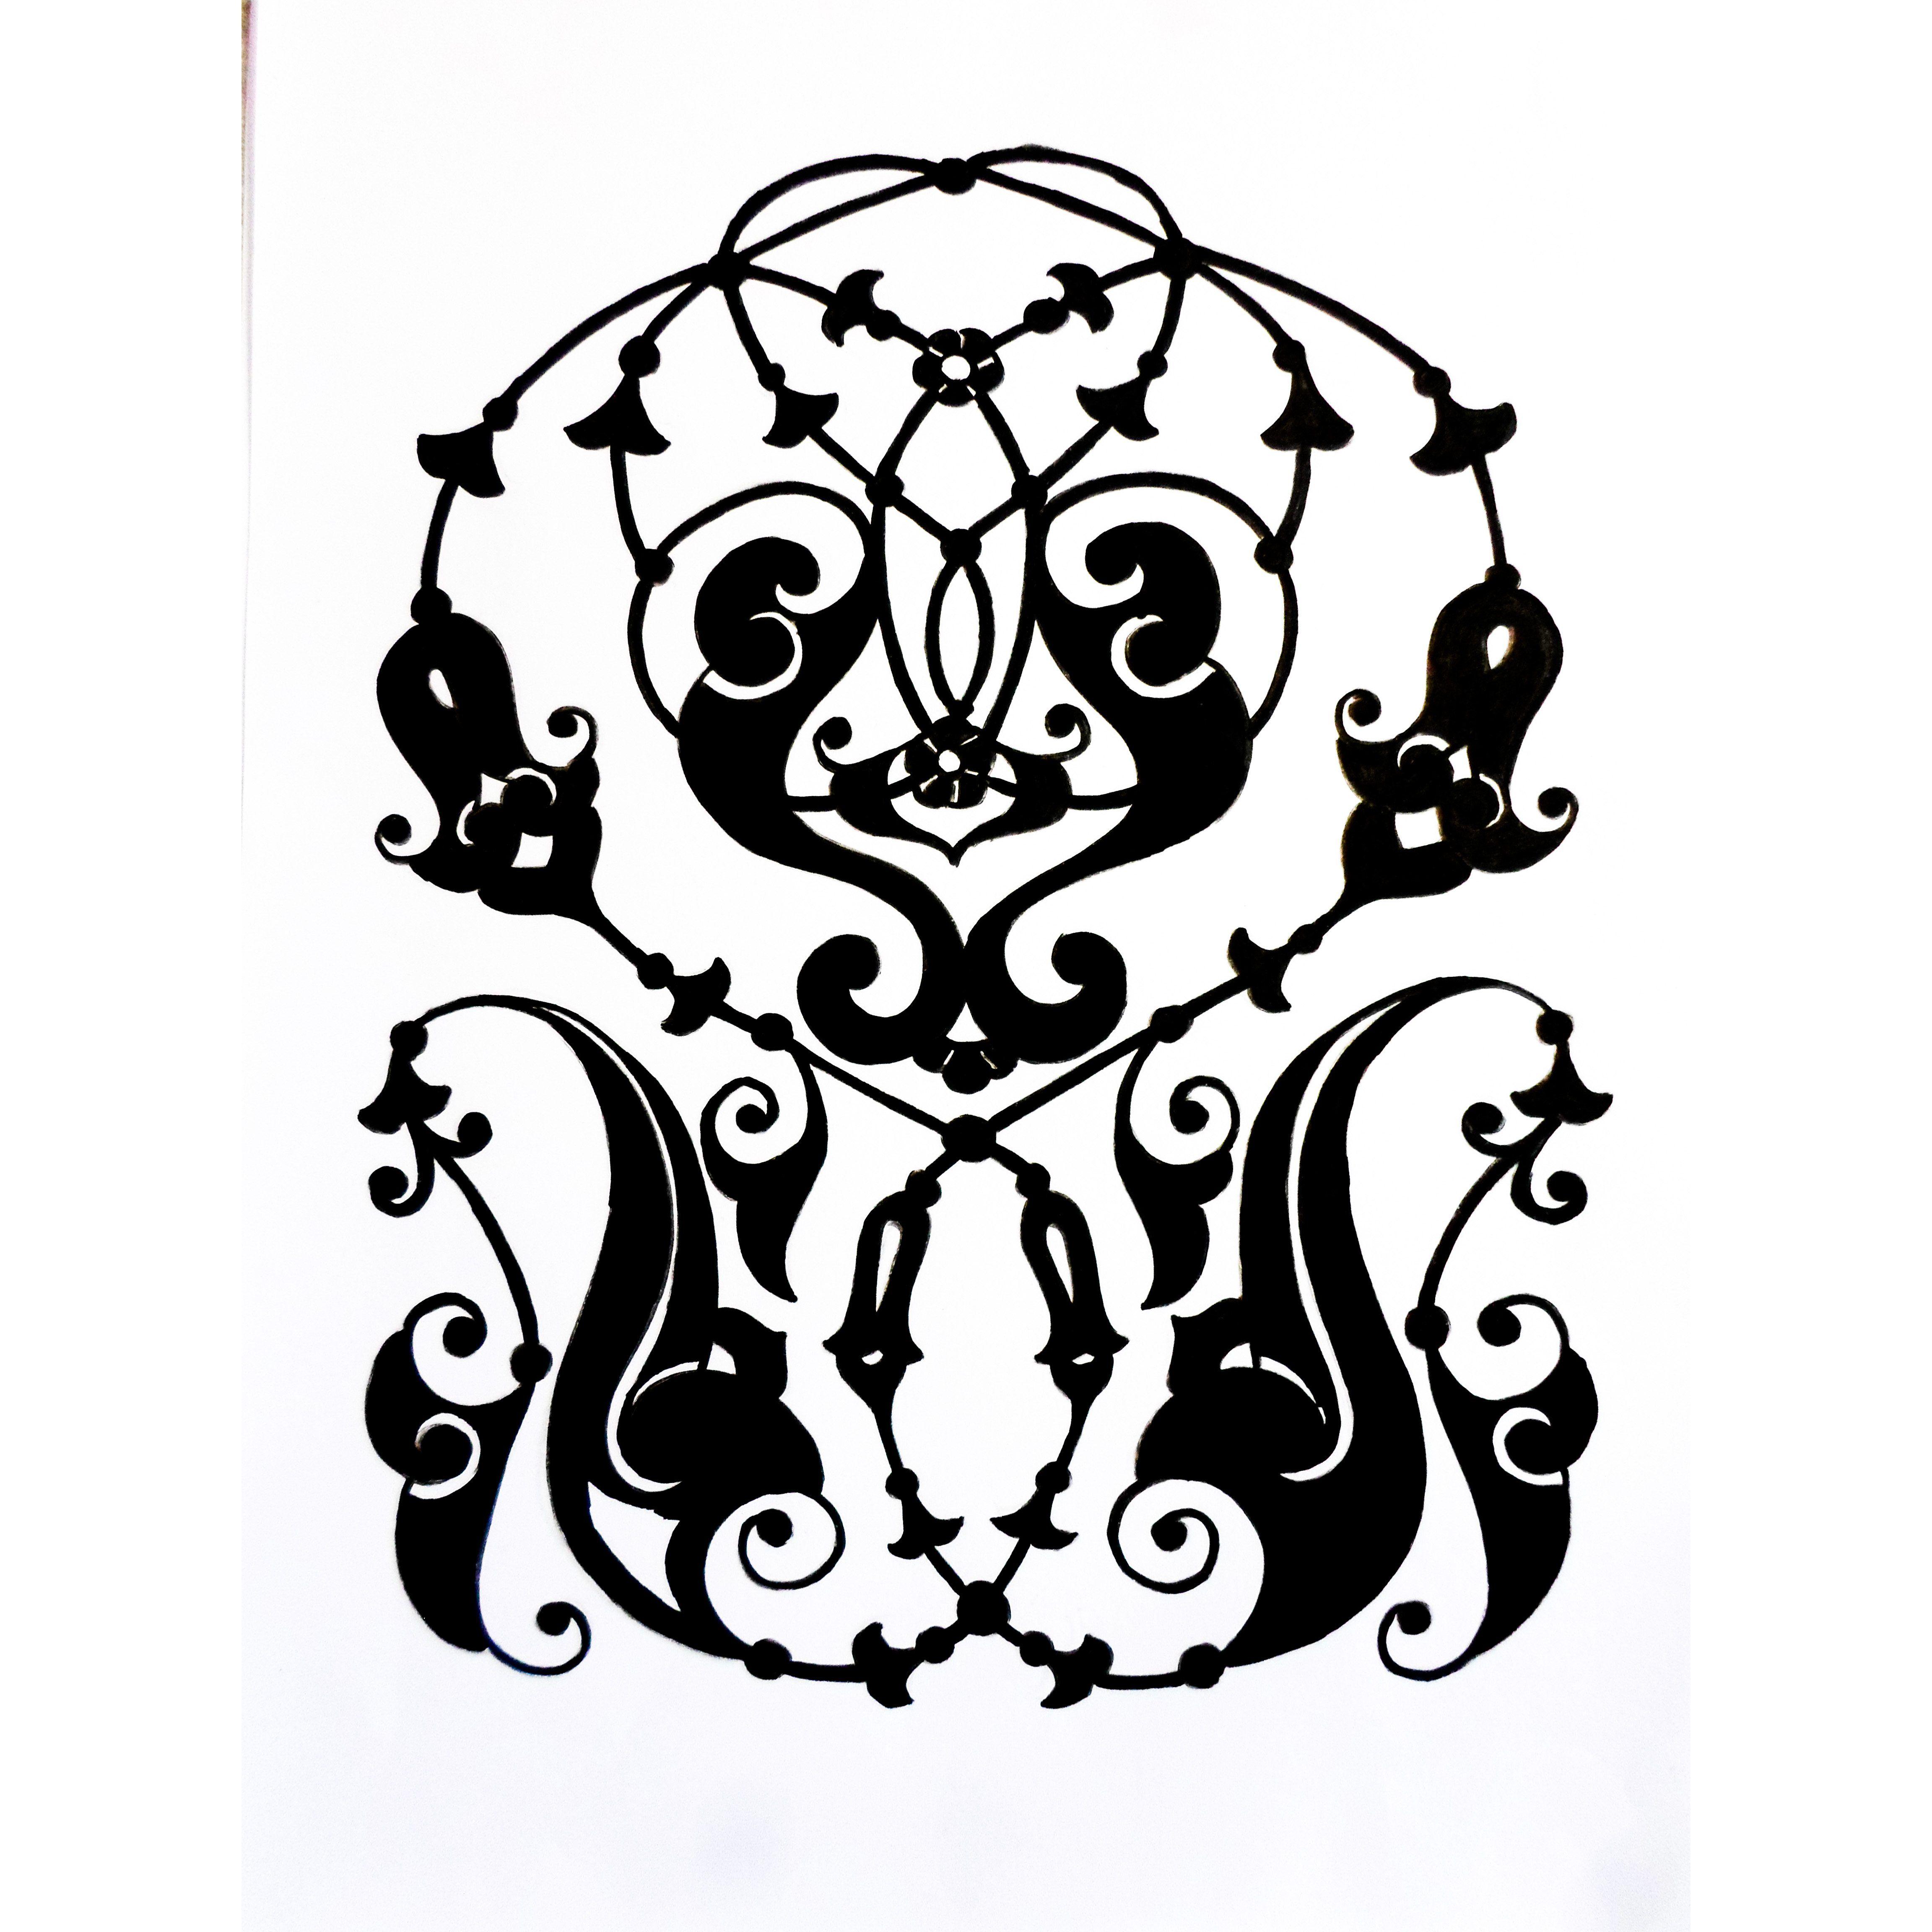 زخرفة Decoration Ornament Frills Ornamentation Decor Embellishment In 2021 Art Embellishments Ornaments